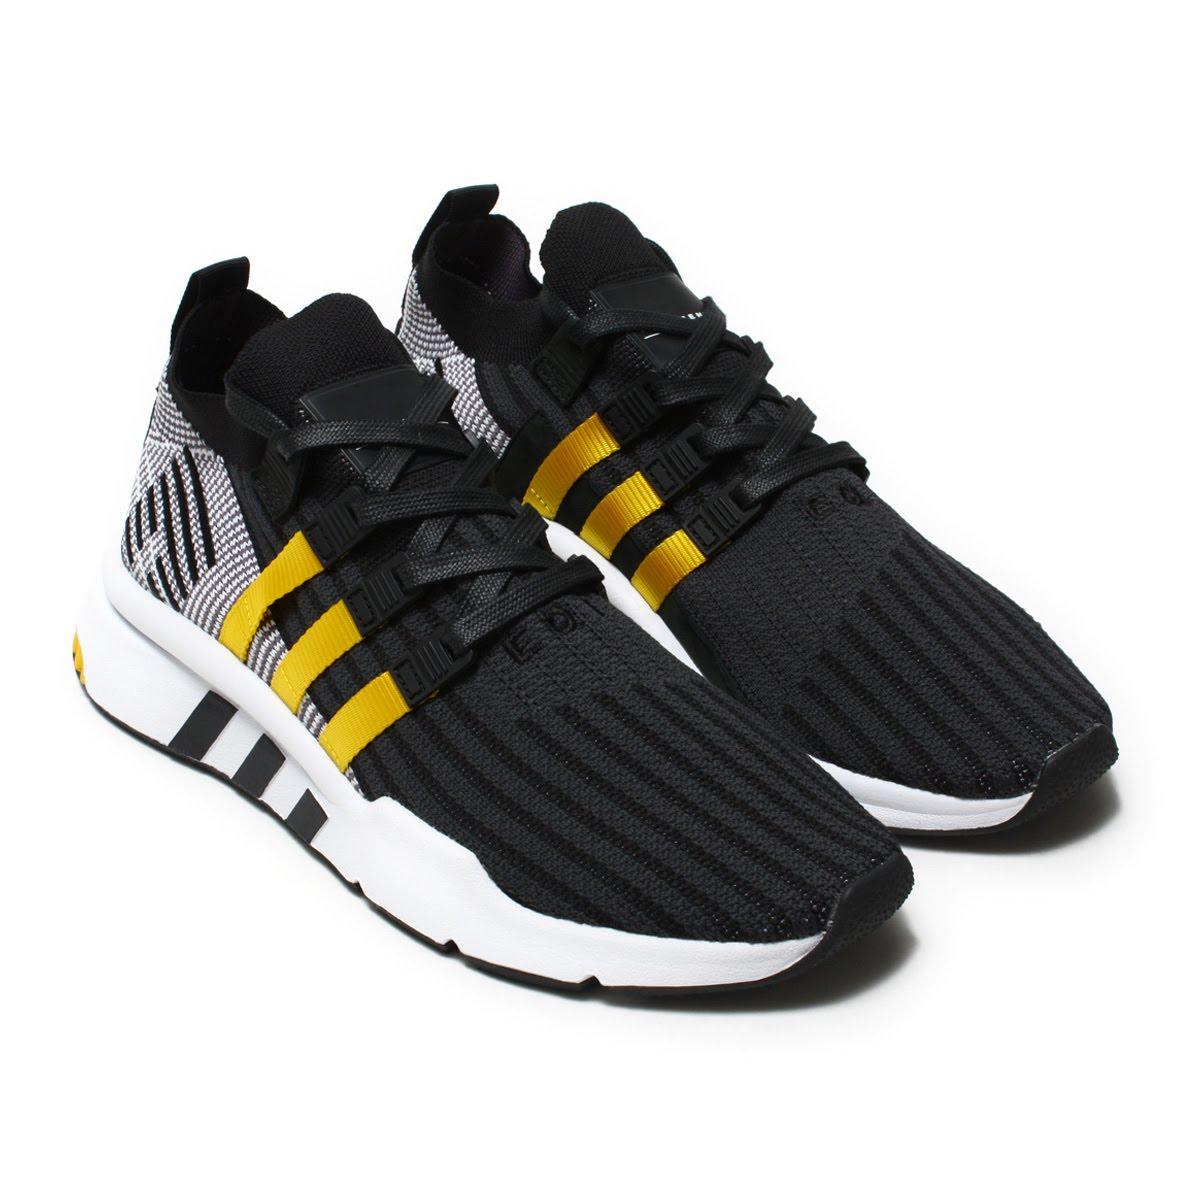 innovative design 4f6f1 19061 adidas Originals EQT SUPPORT MID ADV PK (Adidas originals E cue tea support  mid ADV PK) Core Black/Eqt Yellow/Running White 18SS-I